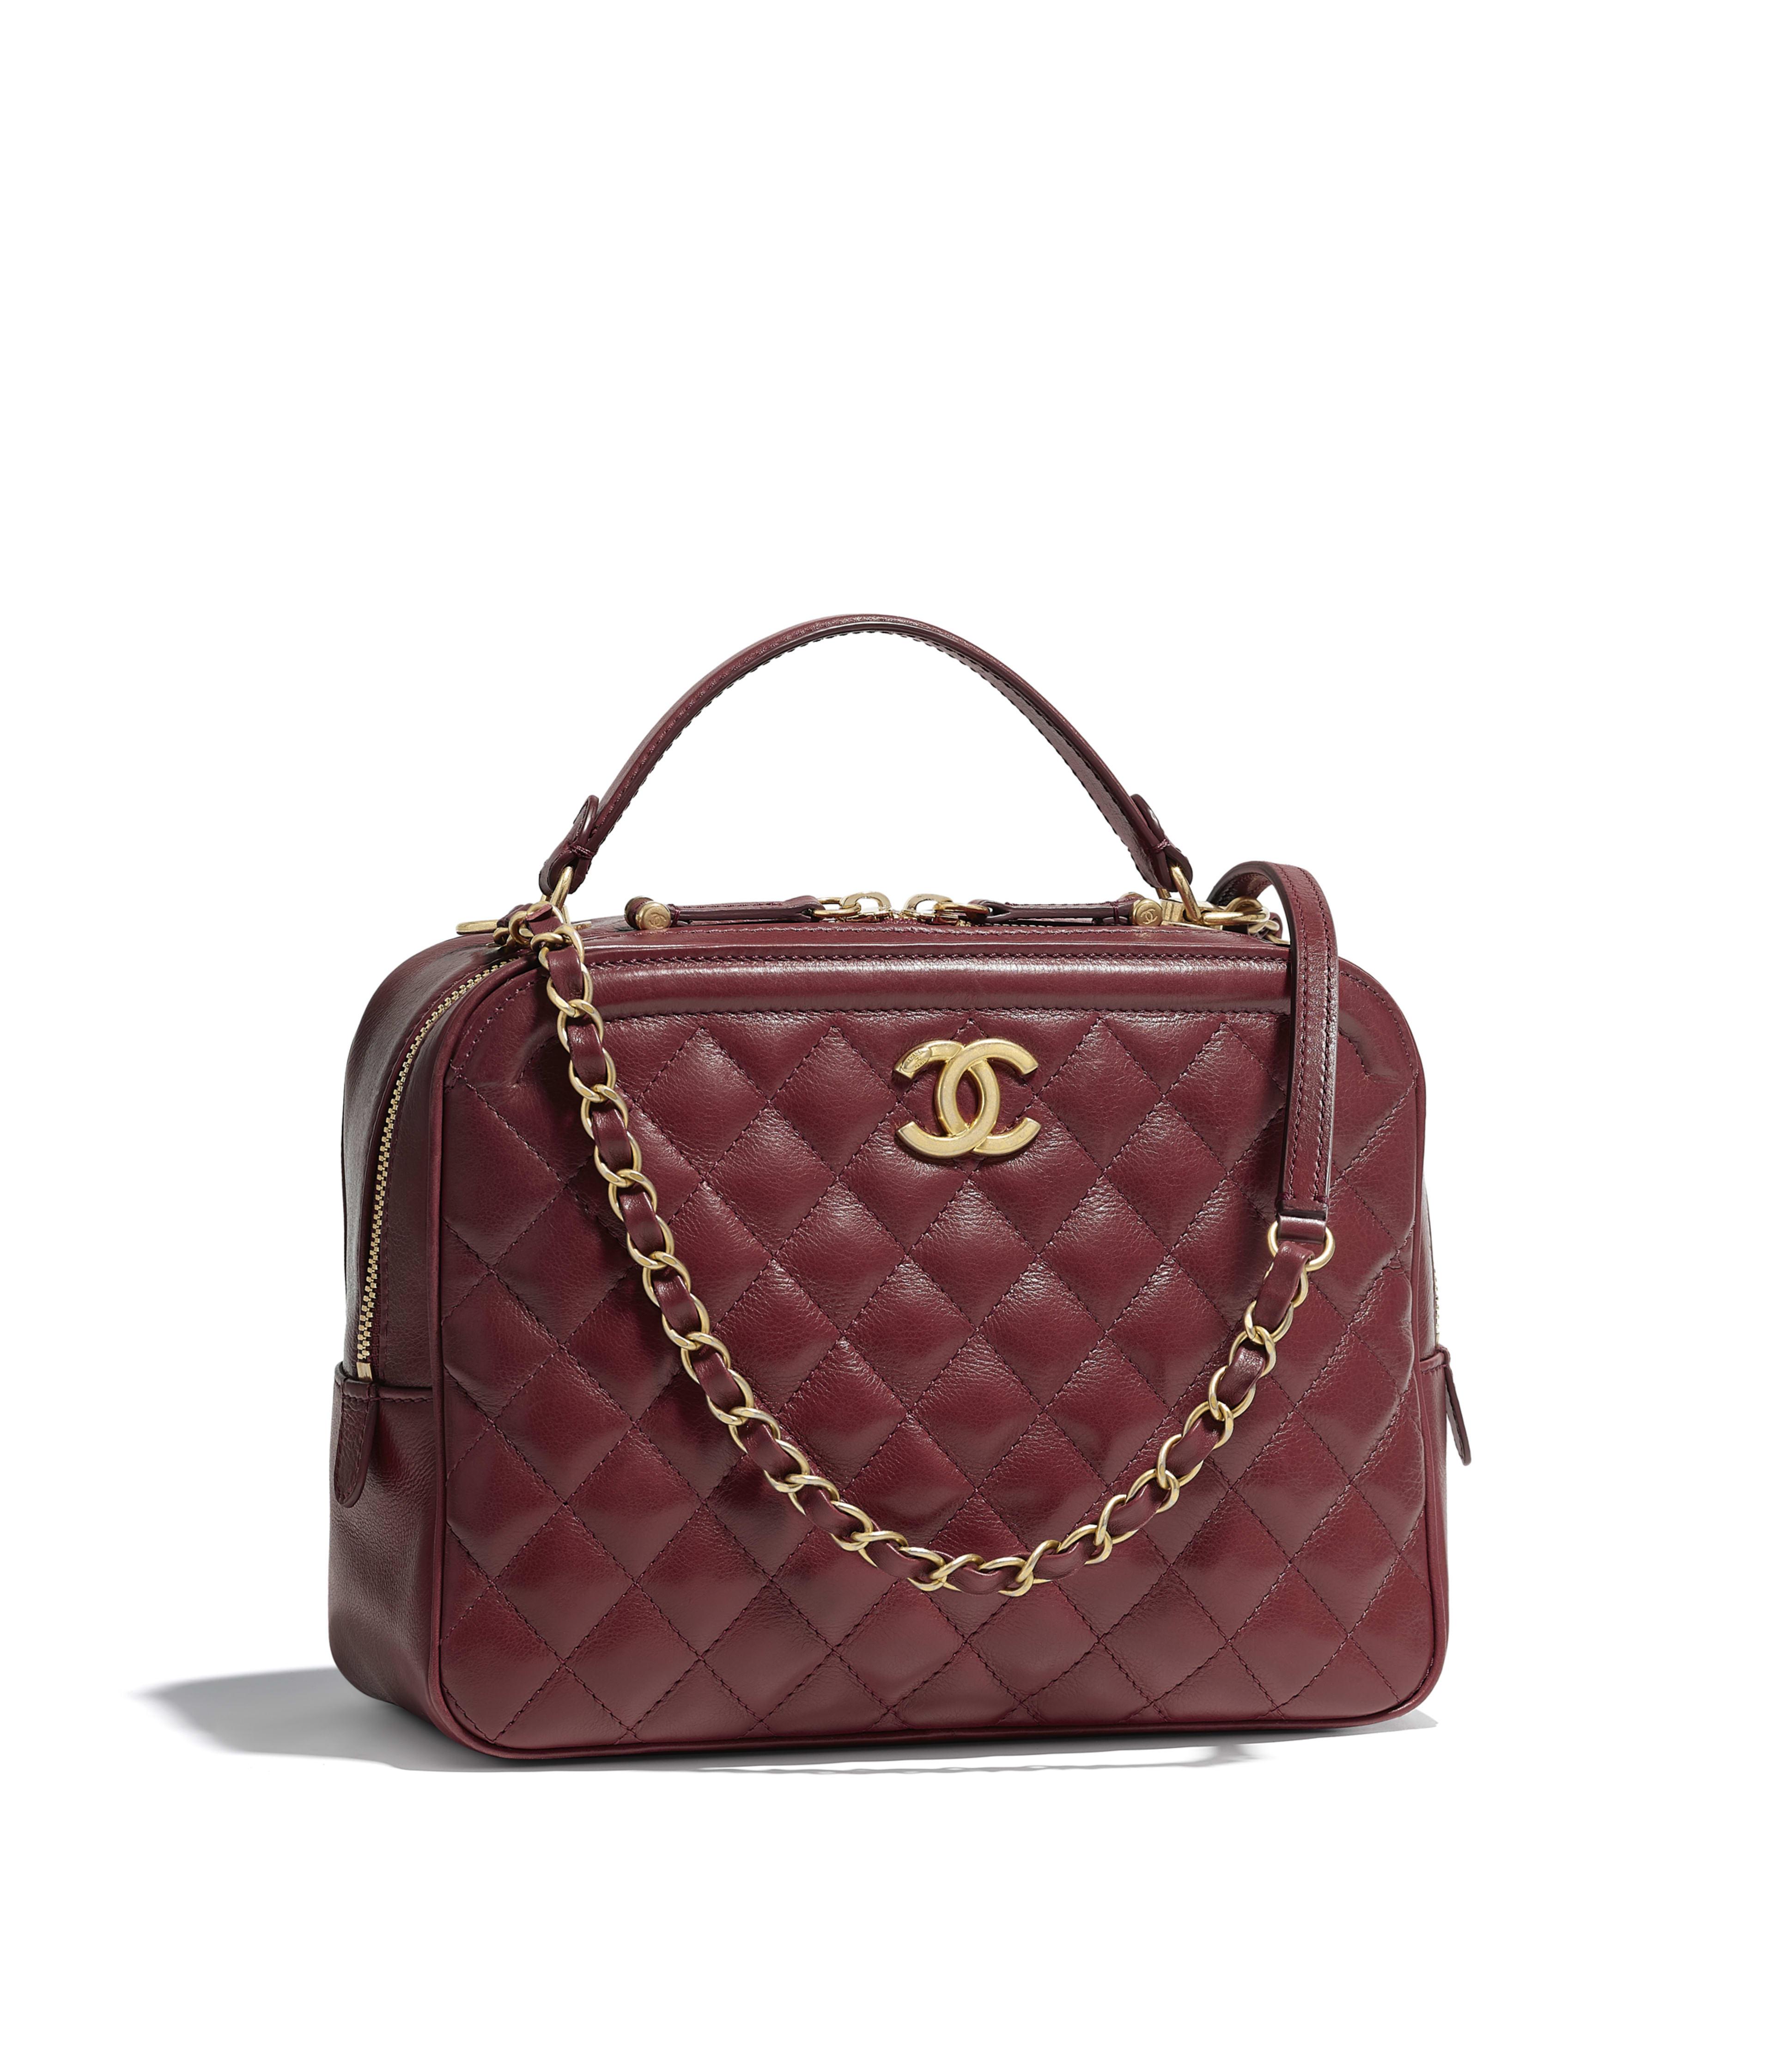 Vanity Chanel case bag pictures